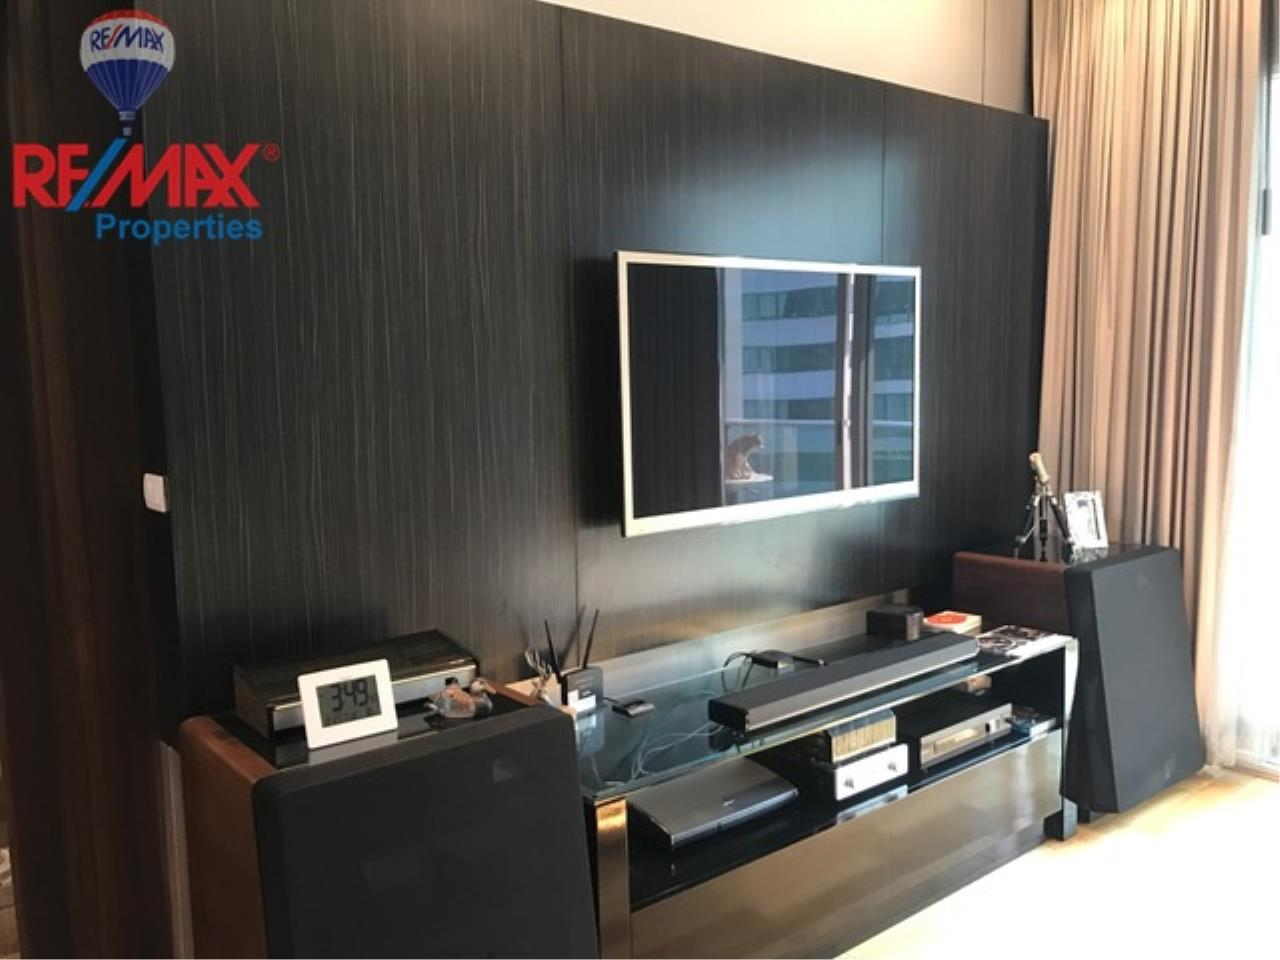 1 Bedroom At Millennuim Residence Sukhumvit Sale Millennium Residence 2 1 Bedroom 128 Sqm For Sale Prakard